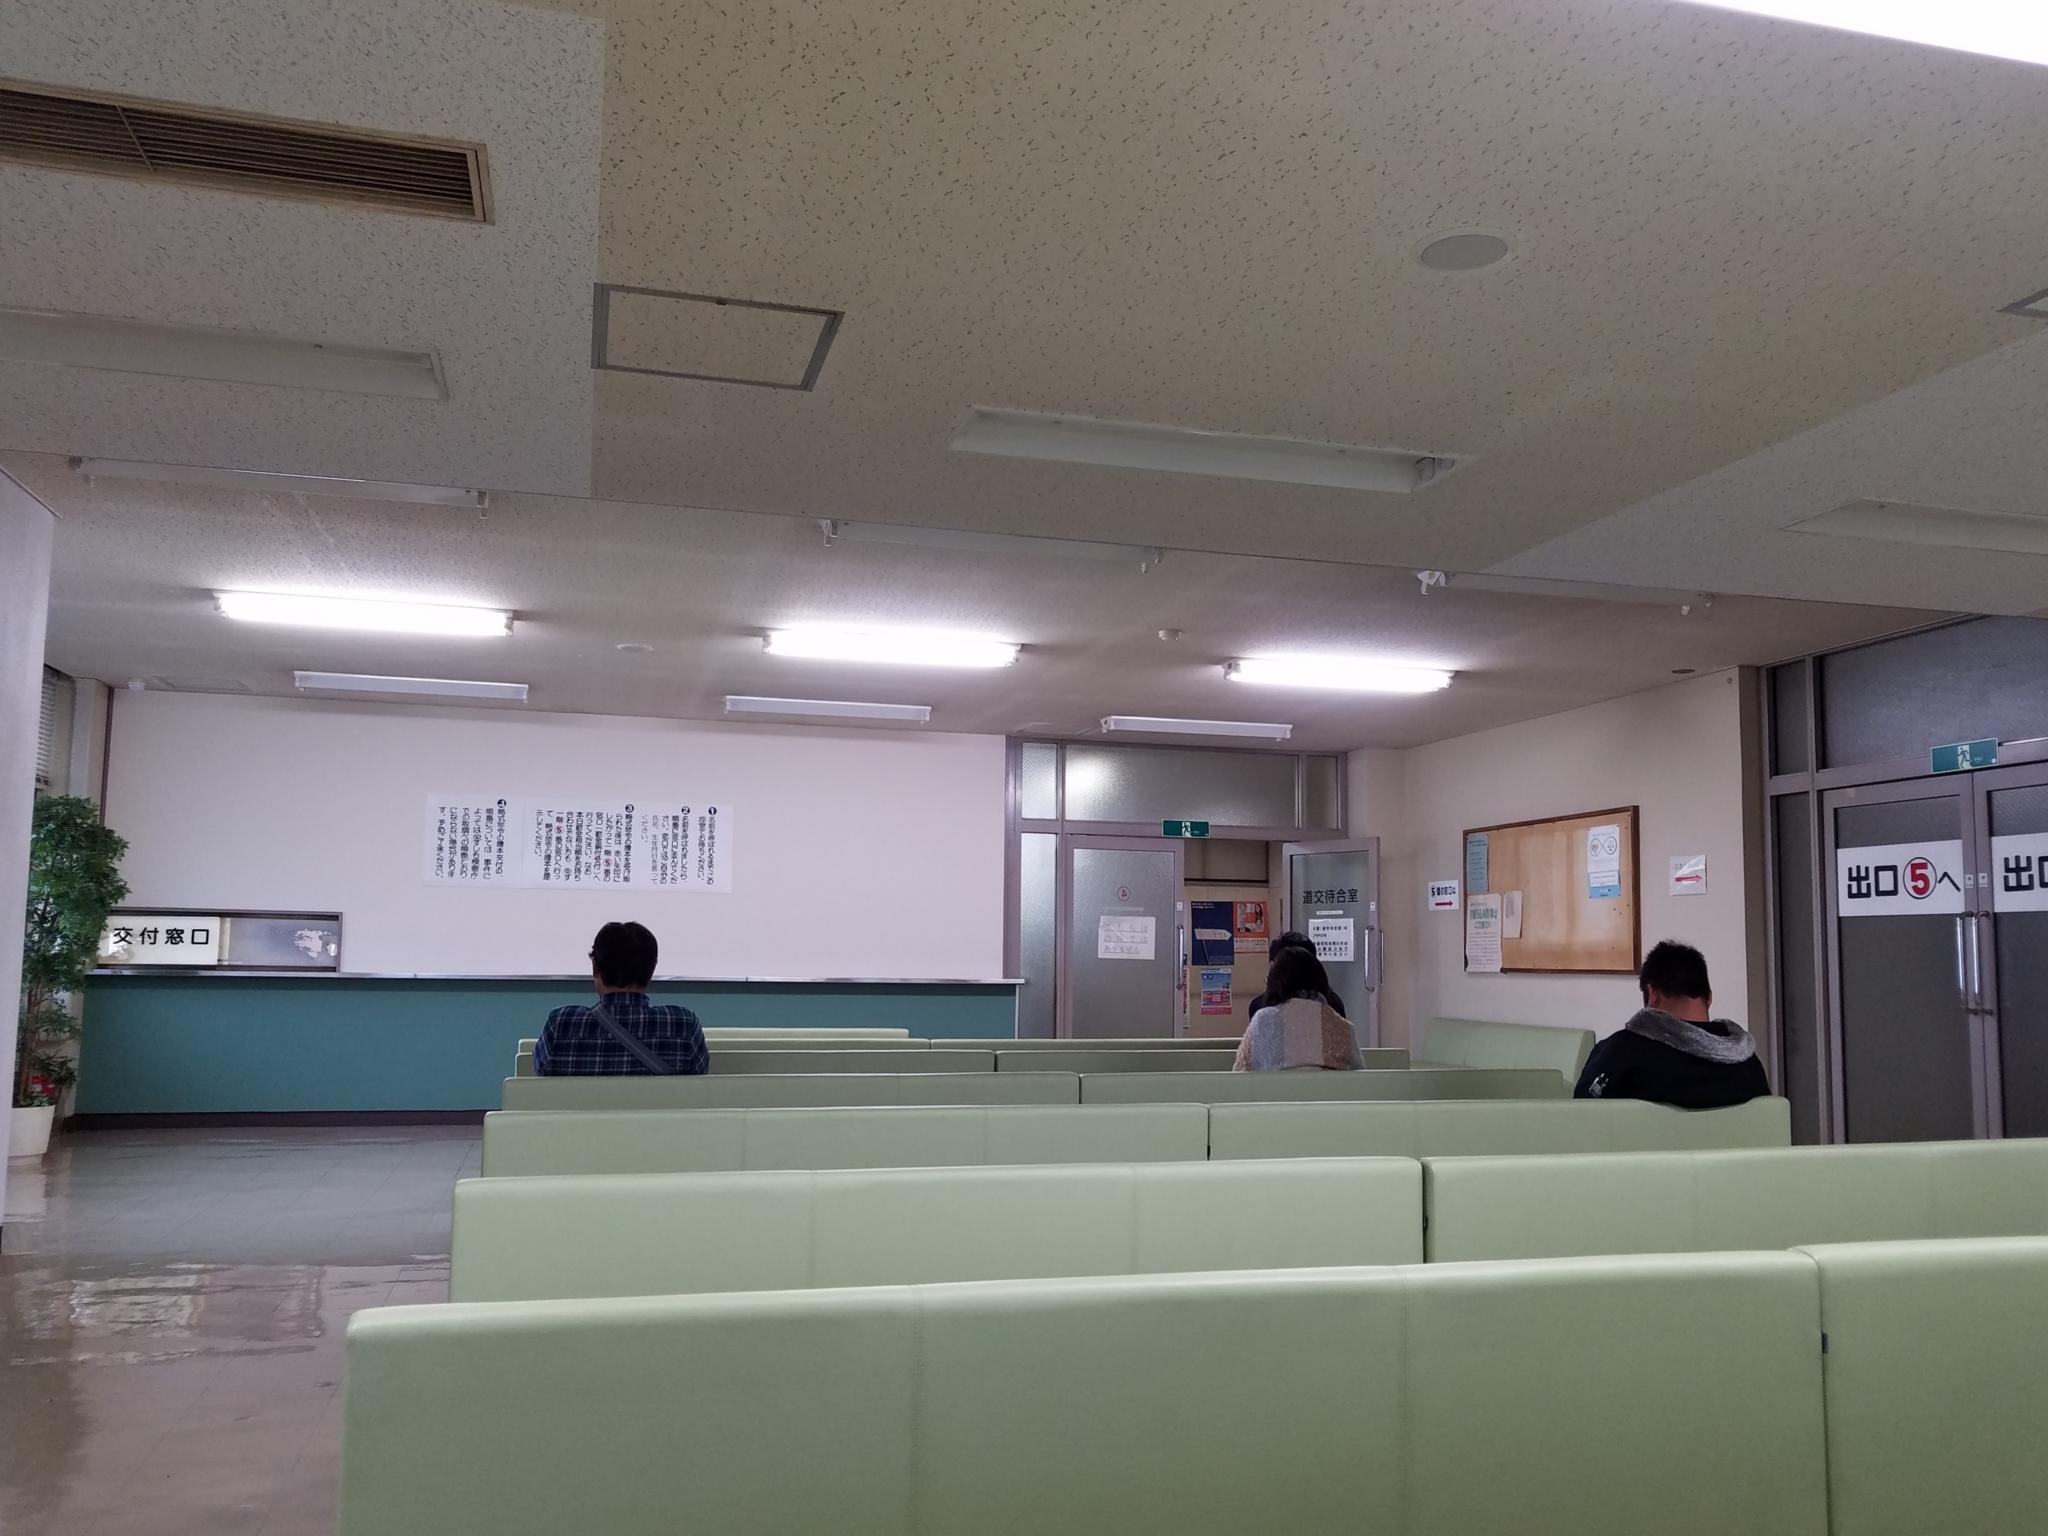 f:id:ToshUeno:20161111140421j:plain